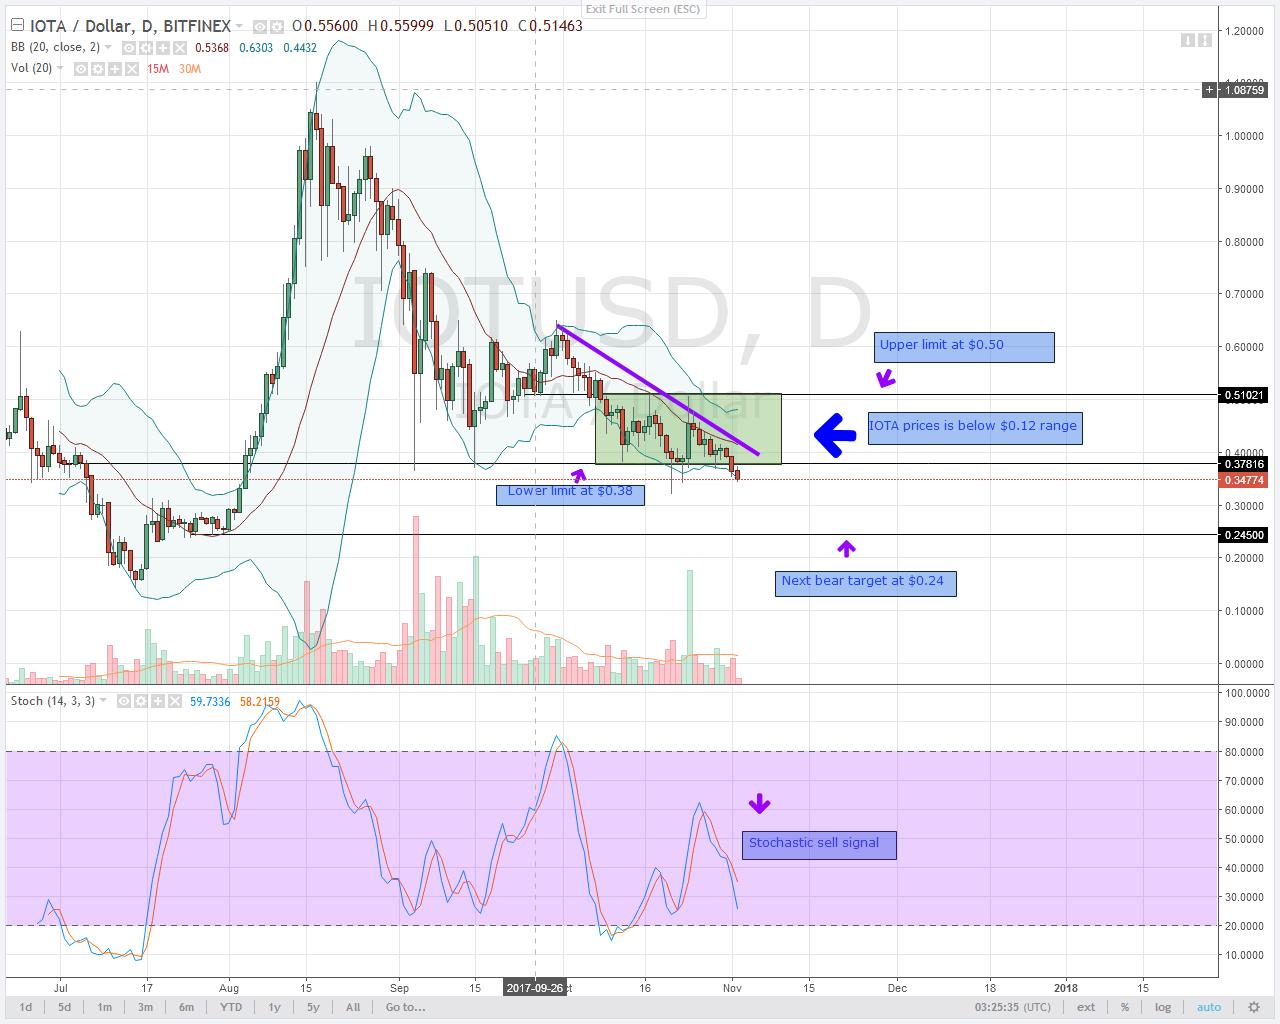 IOTA alt coin trading chart